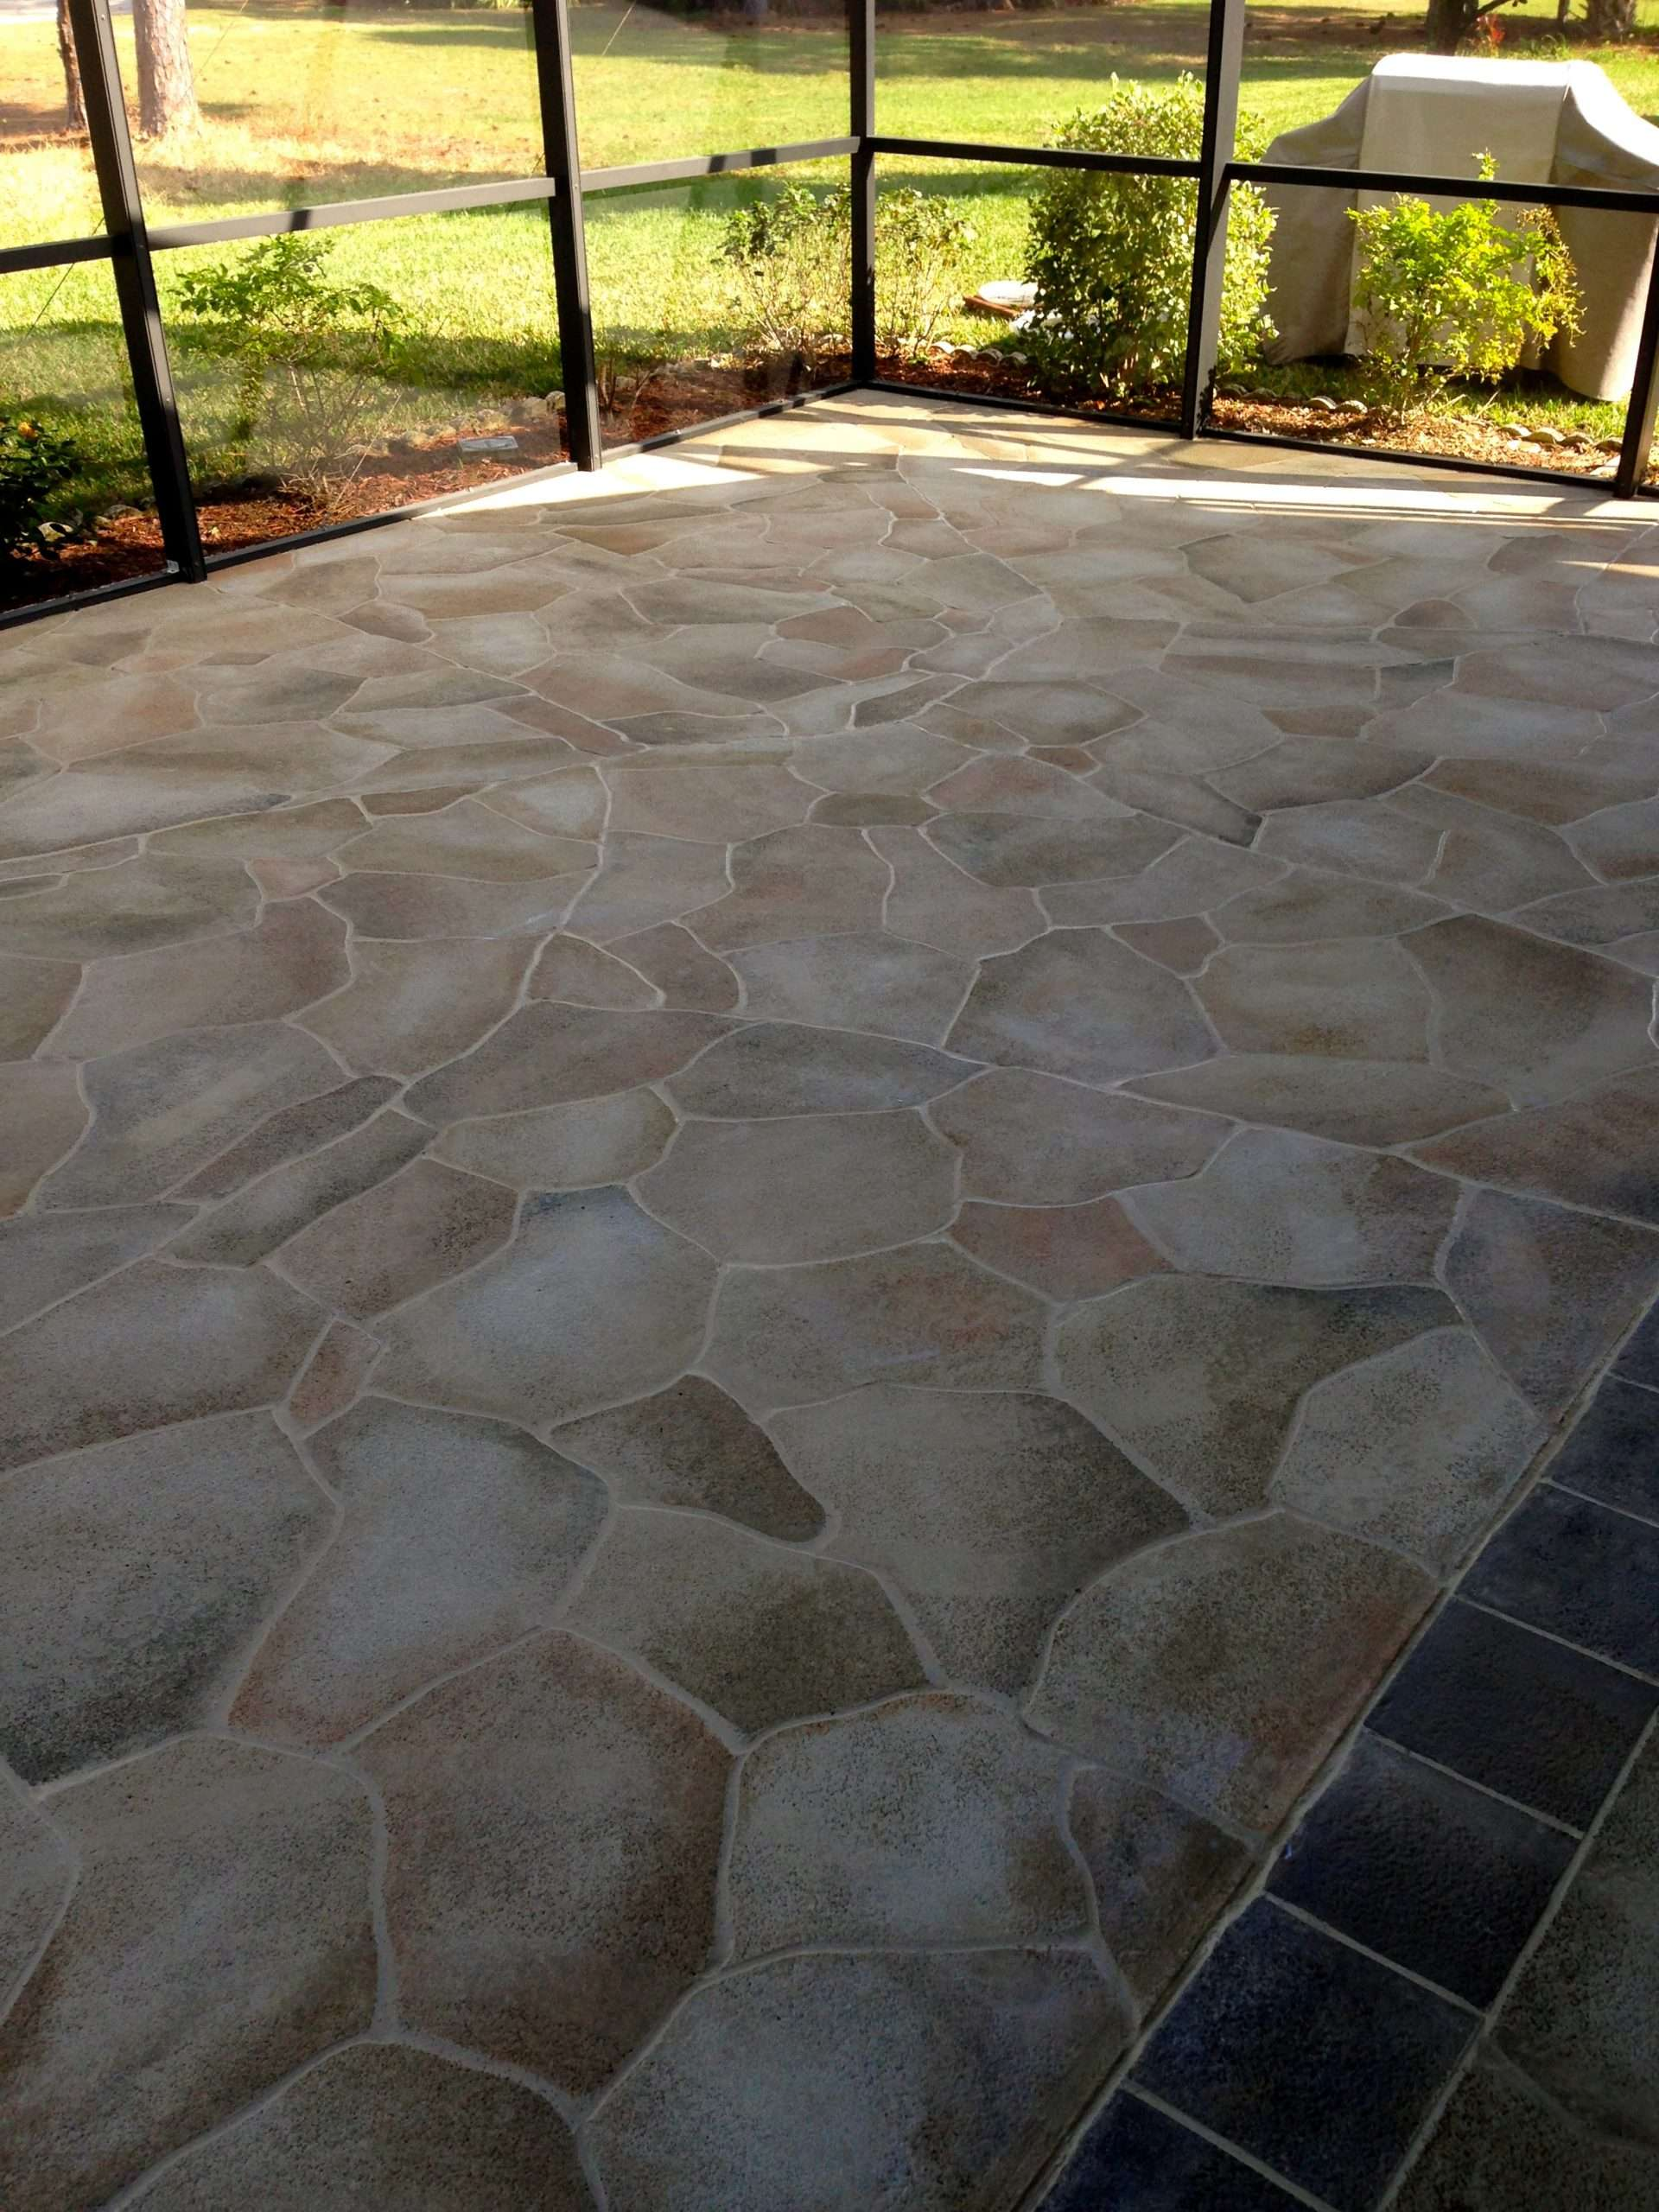 20 Ideas for Painted Concrete Patio